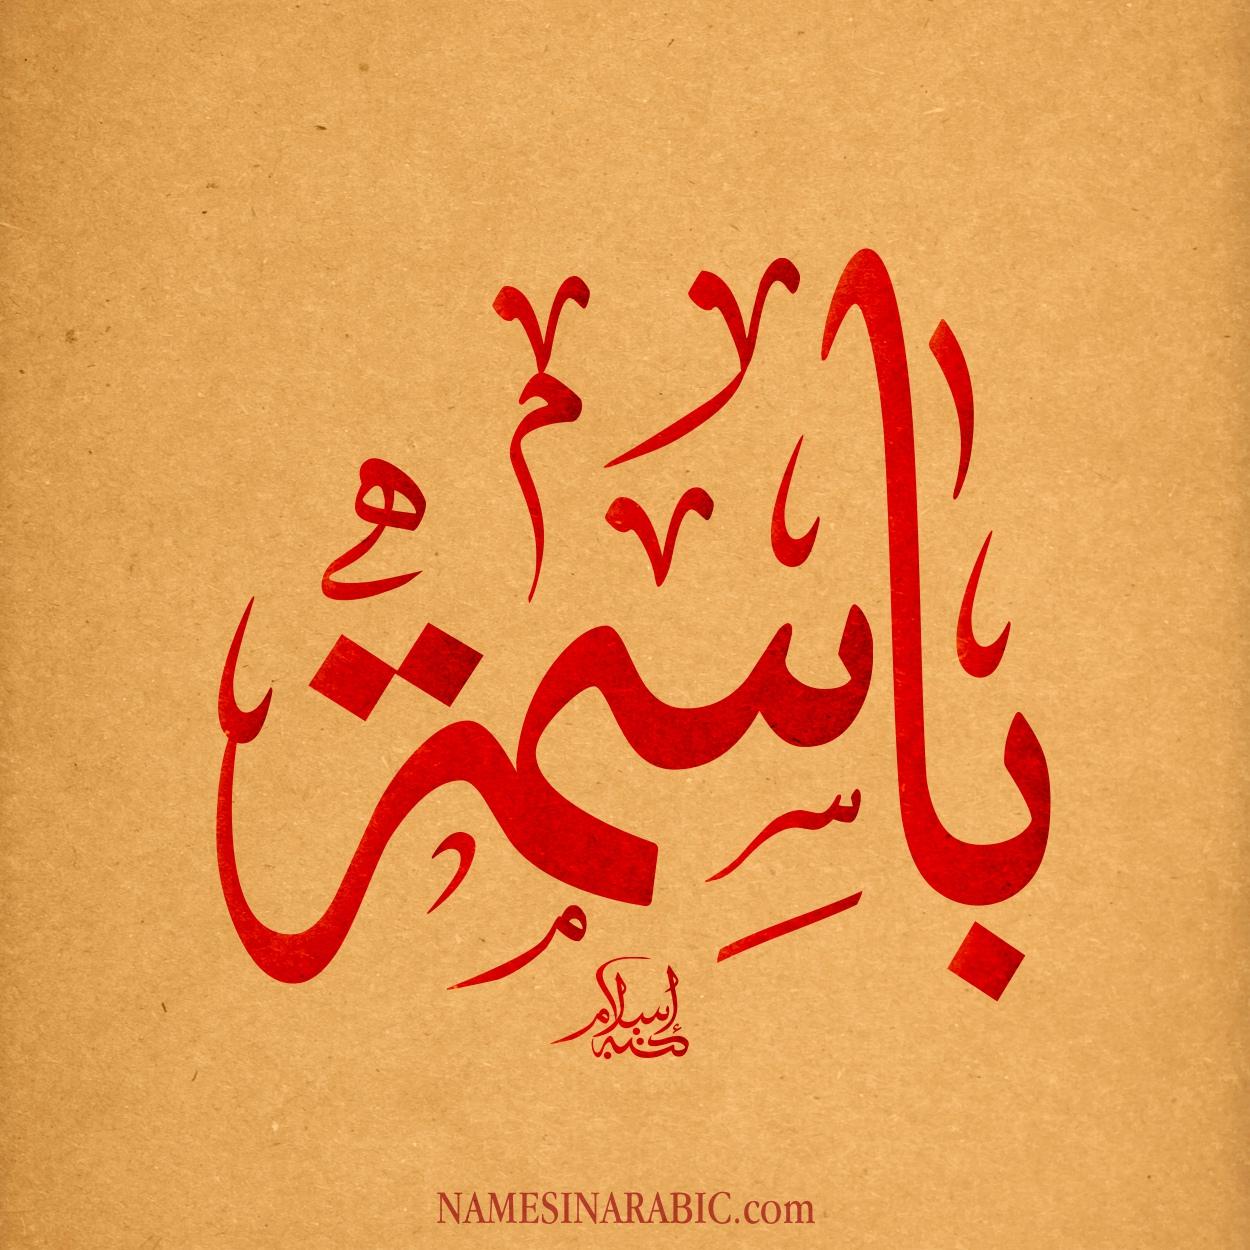 Basimah-Name-in-Arabic-Calligraphy.jpg